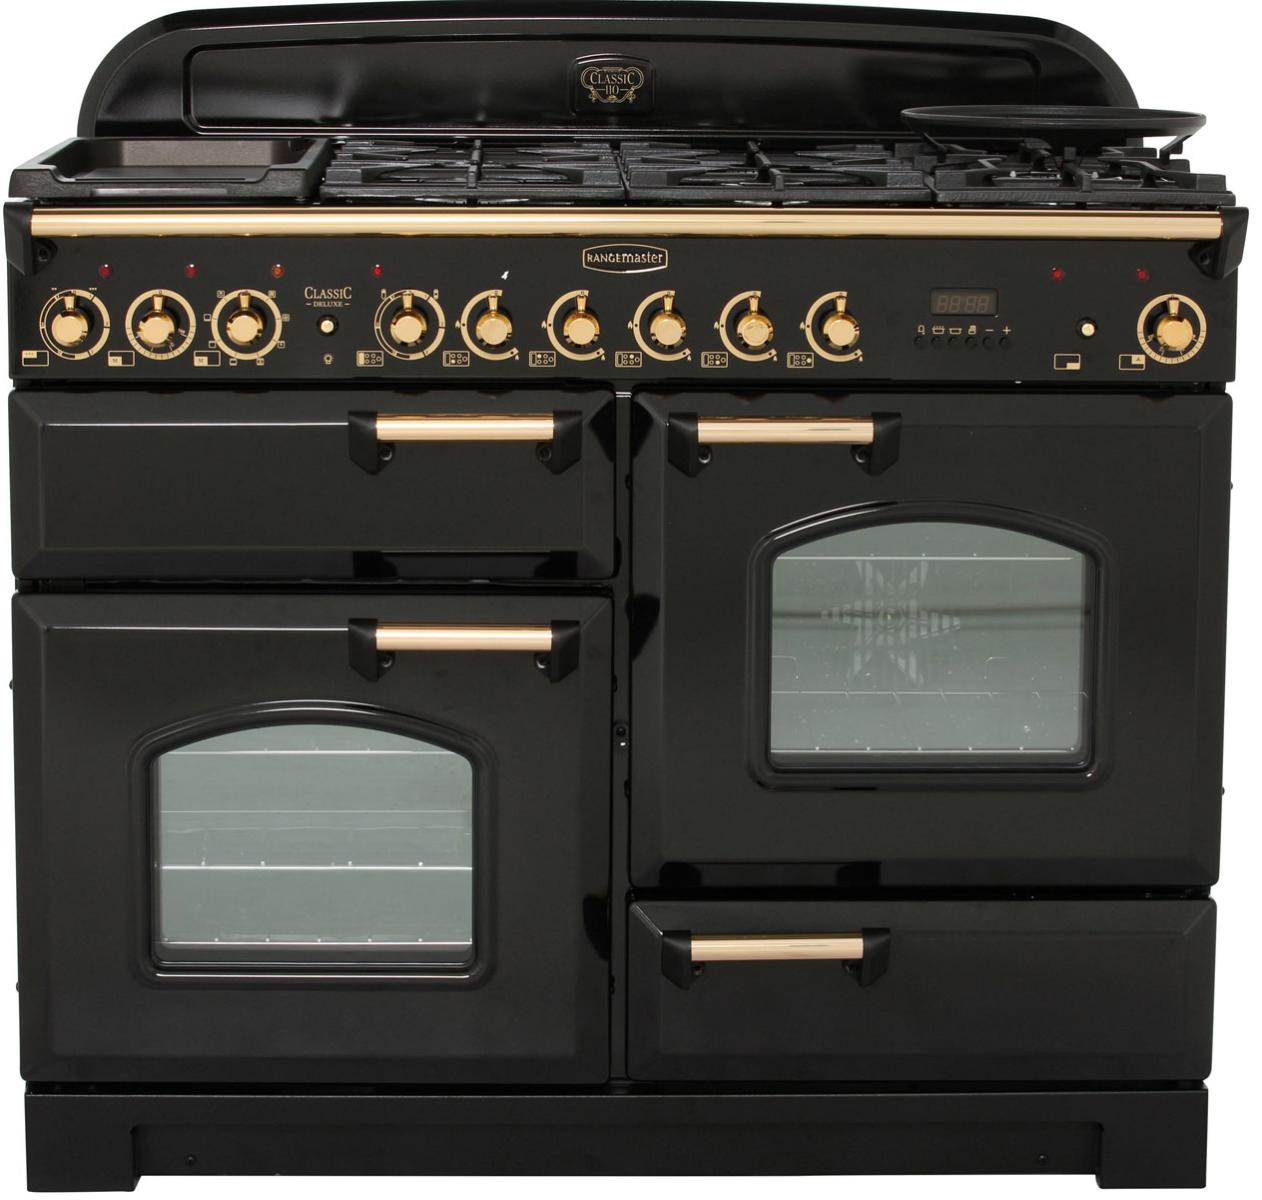 Rangemaster CDL110DFFBL/B Classic Deluxe Range Cooker 110Cm Dual Fuel Black Brass